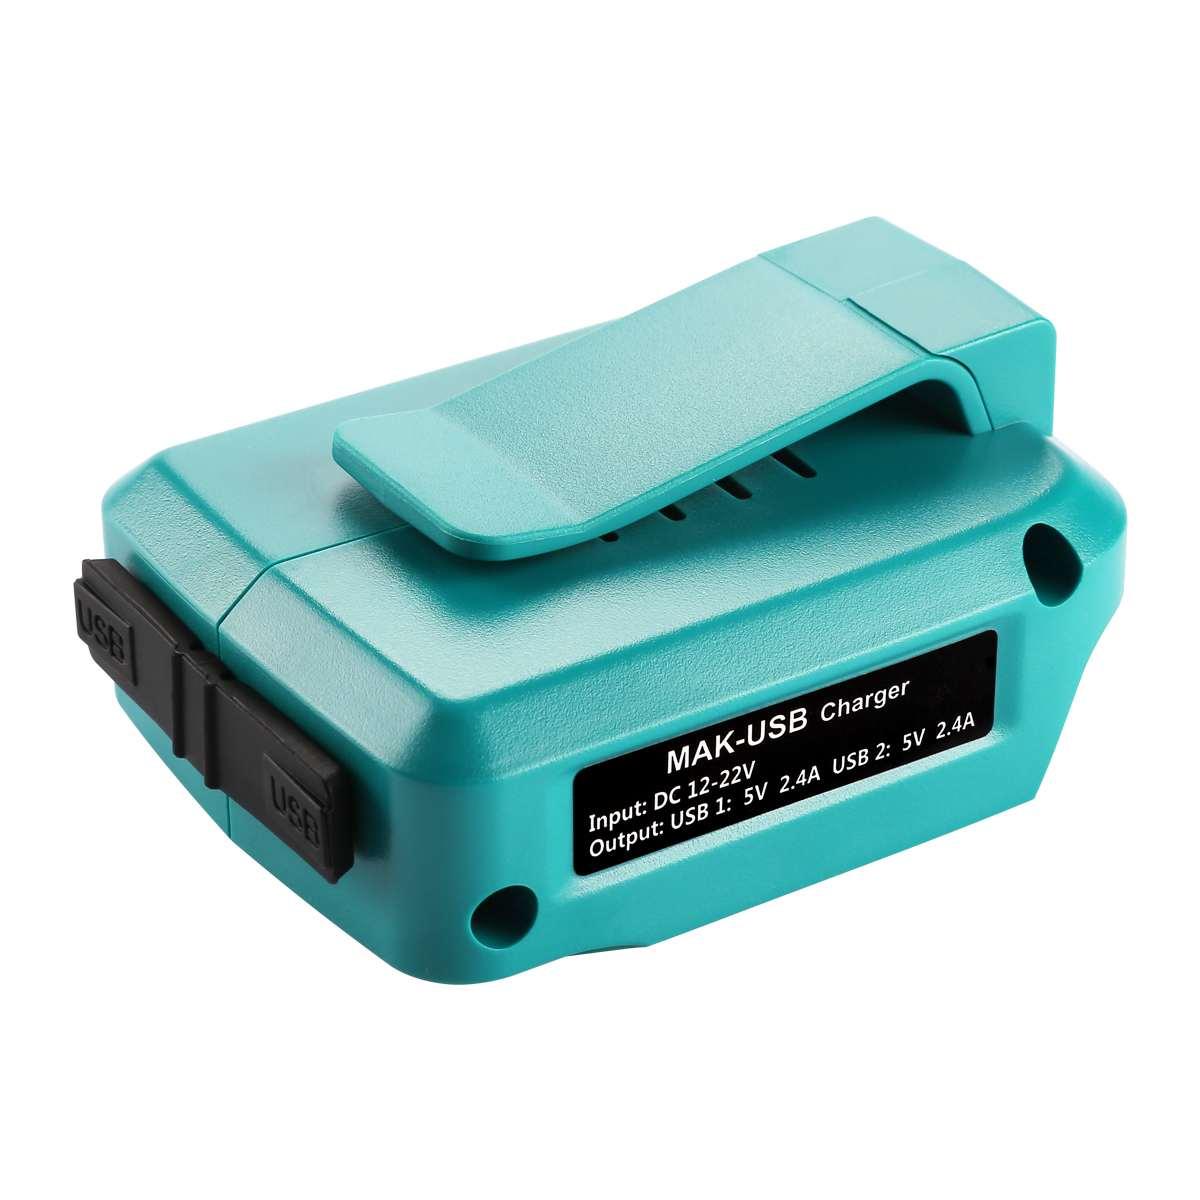 LEORY USB cargador de energía de batería Adaptador convertidor para Makita ADP05 18V 14,4 V Li-ion batería BL1415 BL1430 BL1815